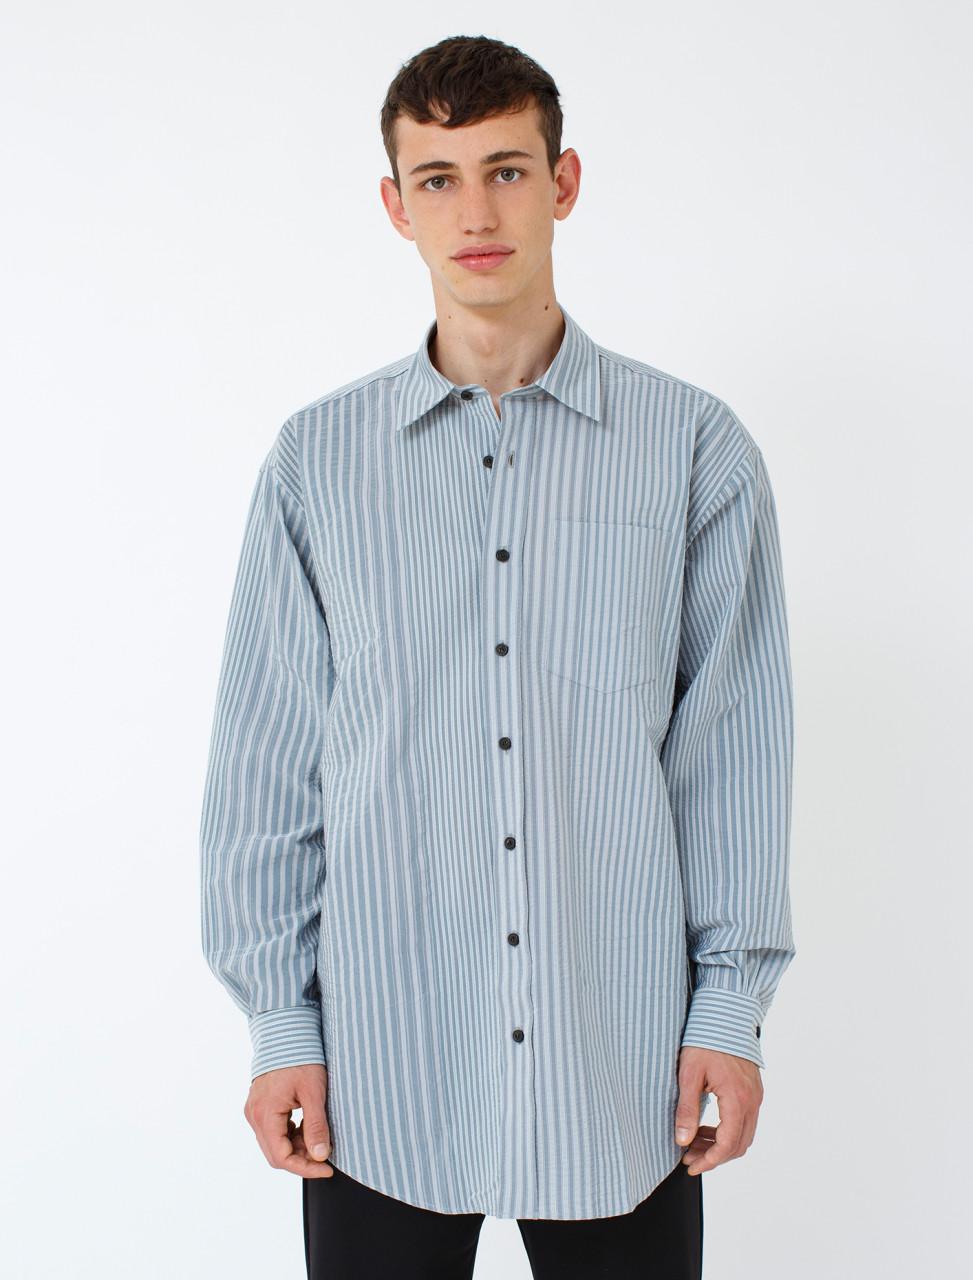 Atlent New Structured Shirt